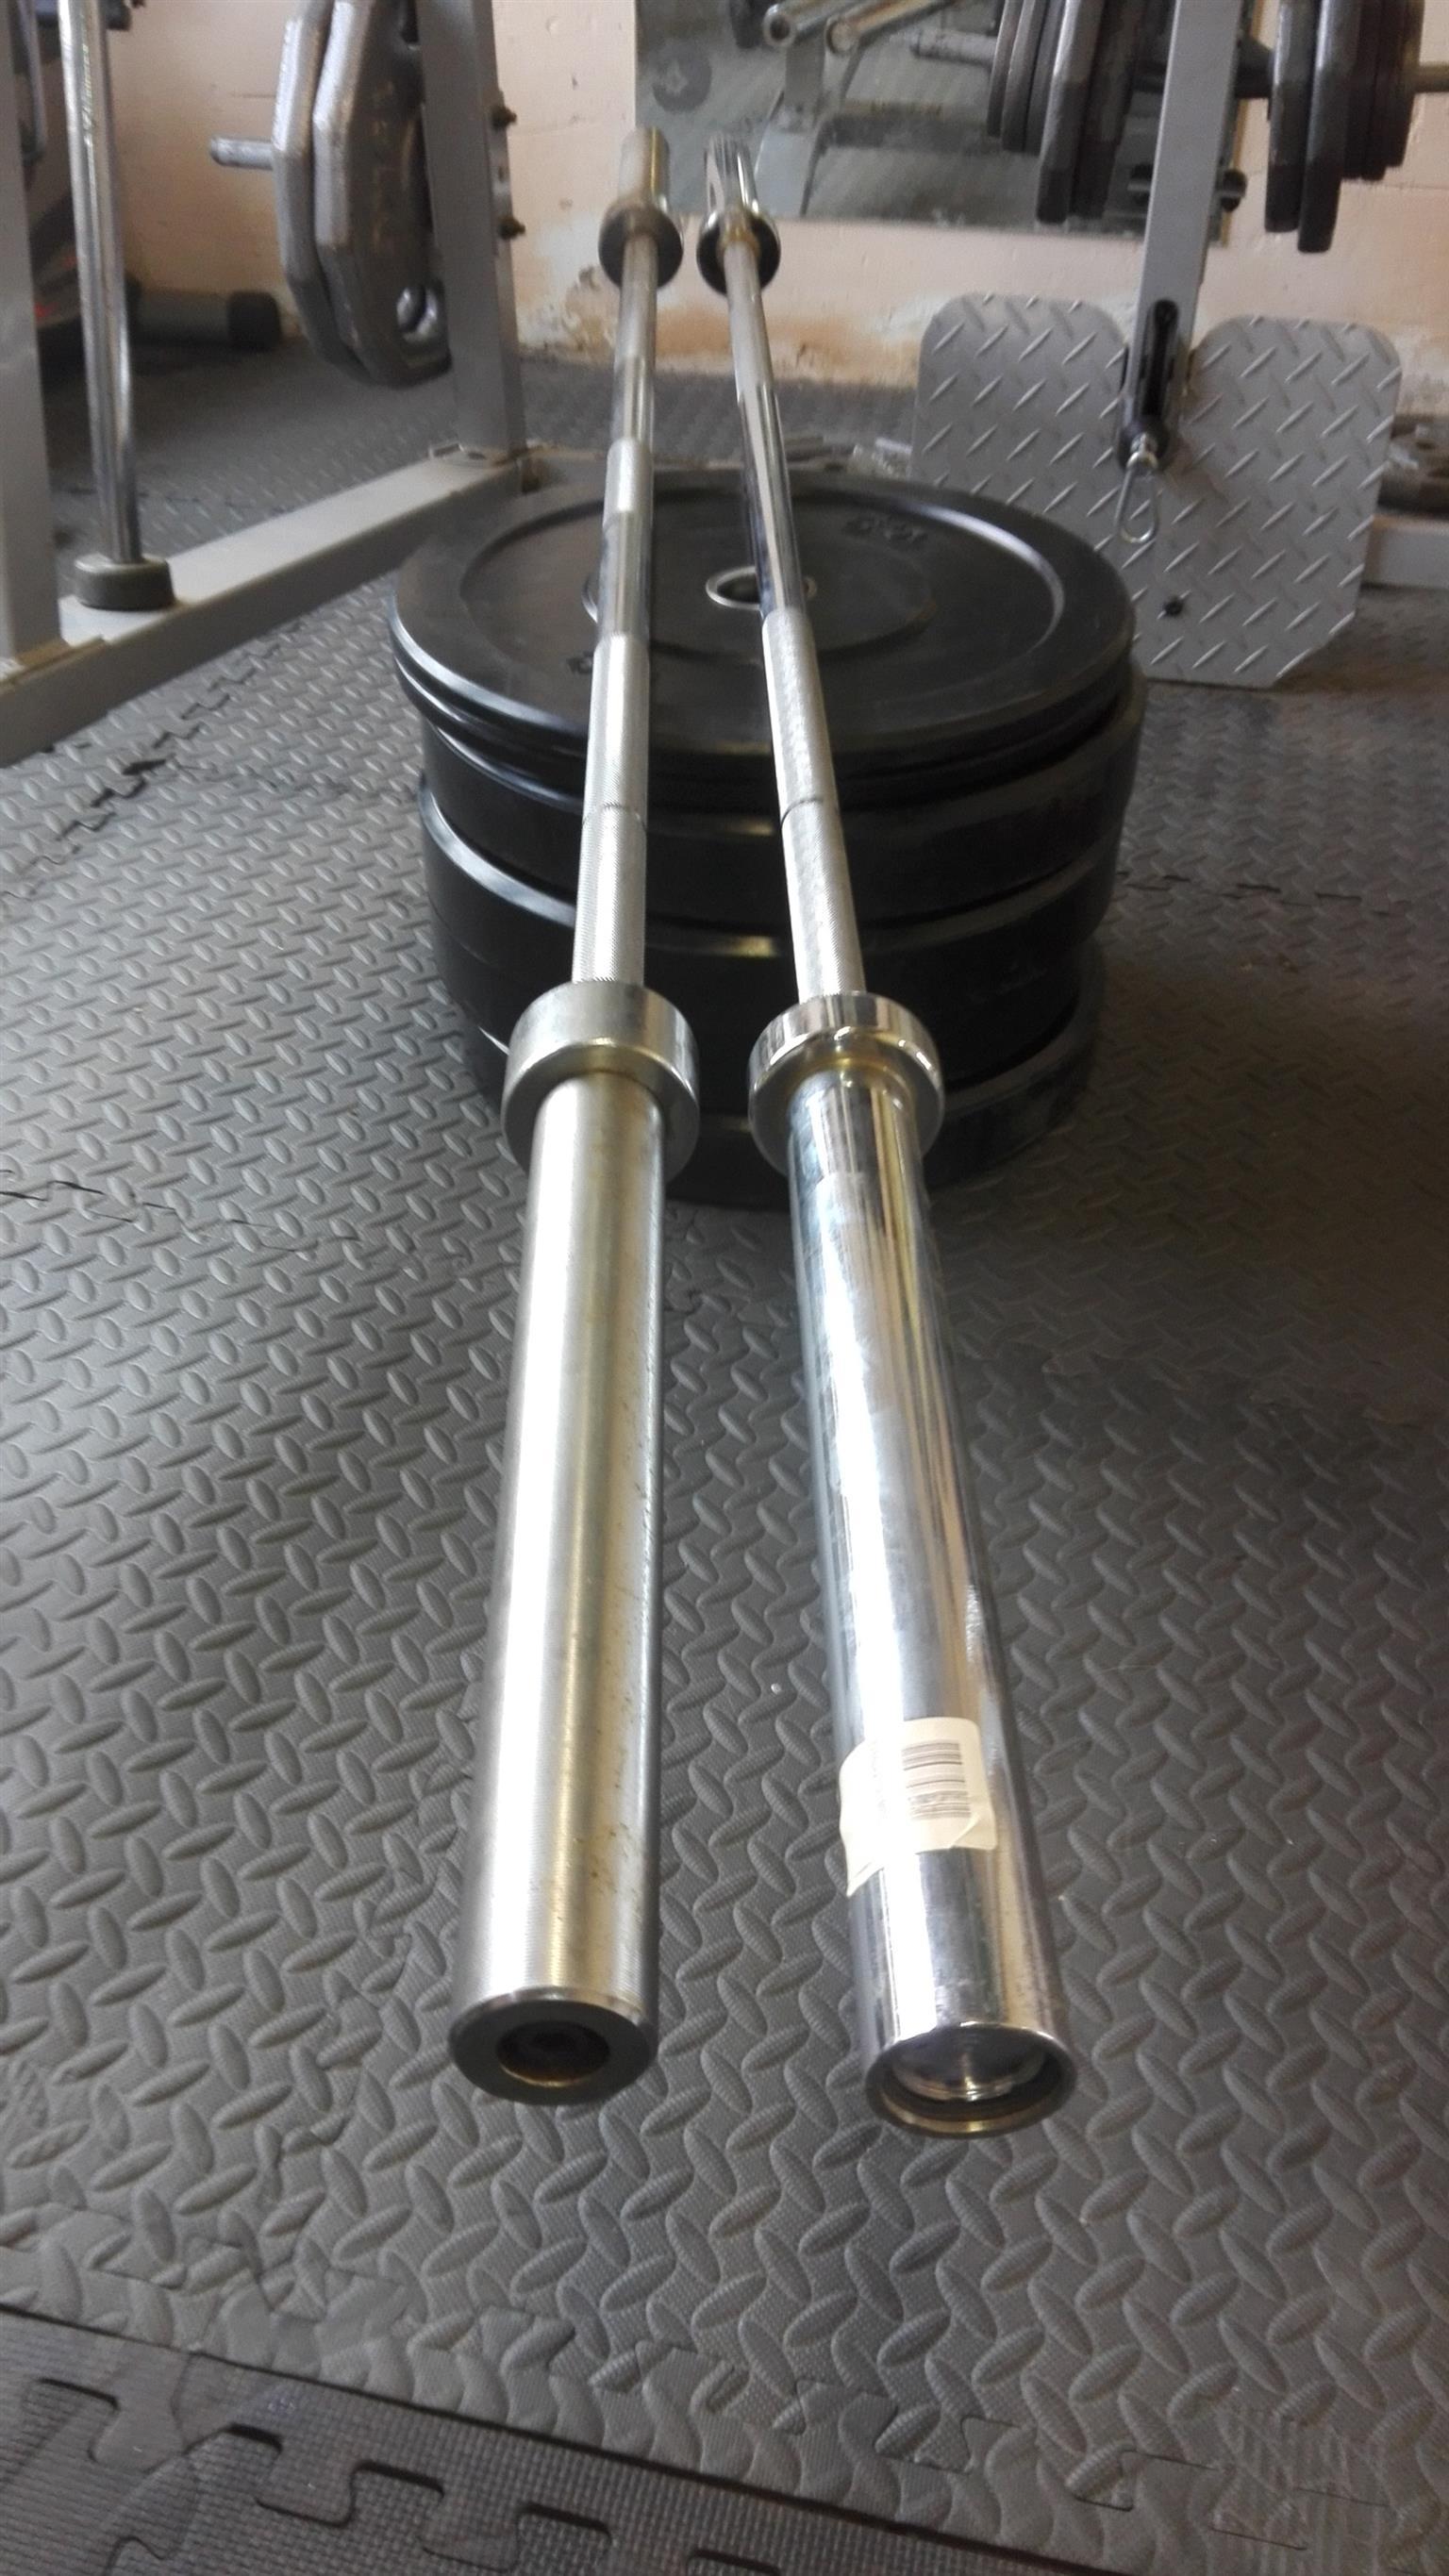 2 Olympic bars + 70kg Bumper Plates